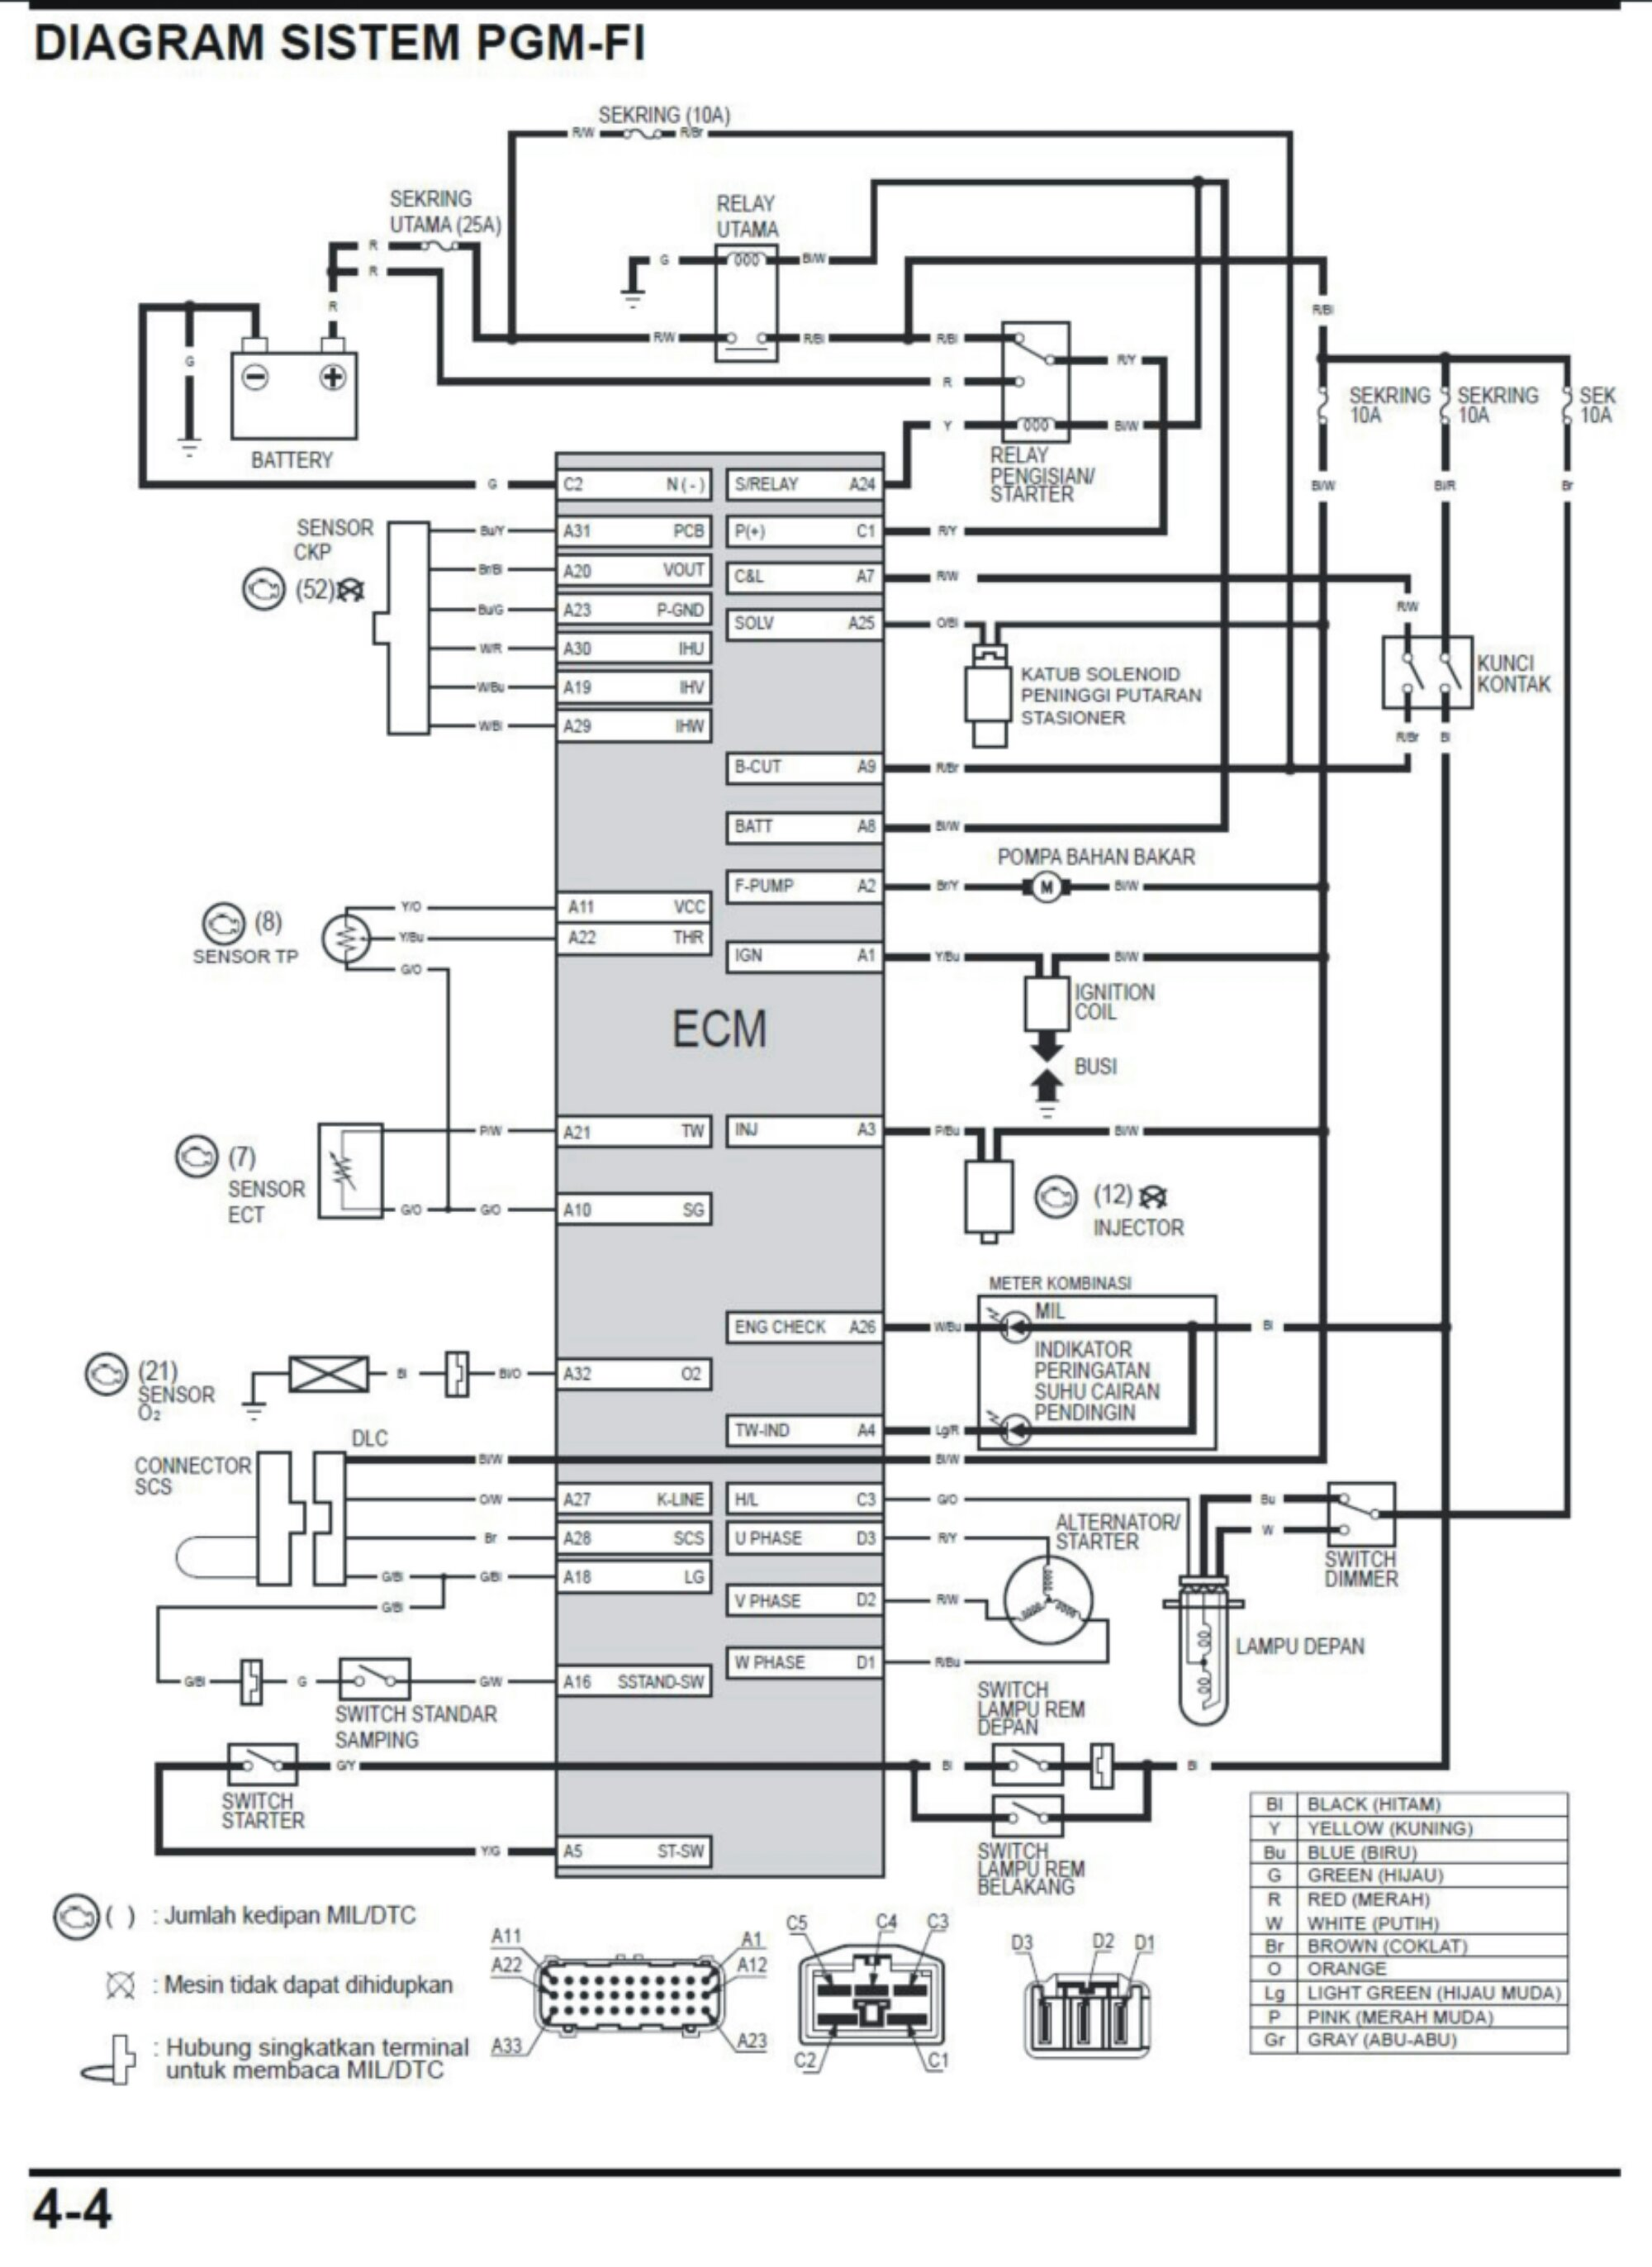 Wiring Honda Diagram Mentropaltain - on honda design diagram, honda schematic diagram, honda thermostat diagram, honda sensors diagram, honda maintenance log, honda alternator diagram, honda motorcycles schematics, honda atv diagrams, honda parts diagram, honda ignition diagram, honda lower unit diagram, honda atc carb diagram, honda clutch diagram,